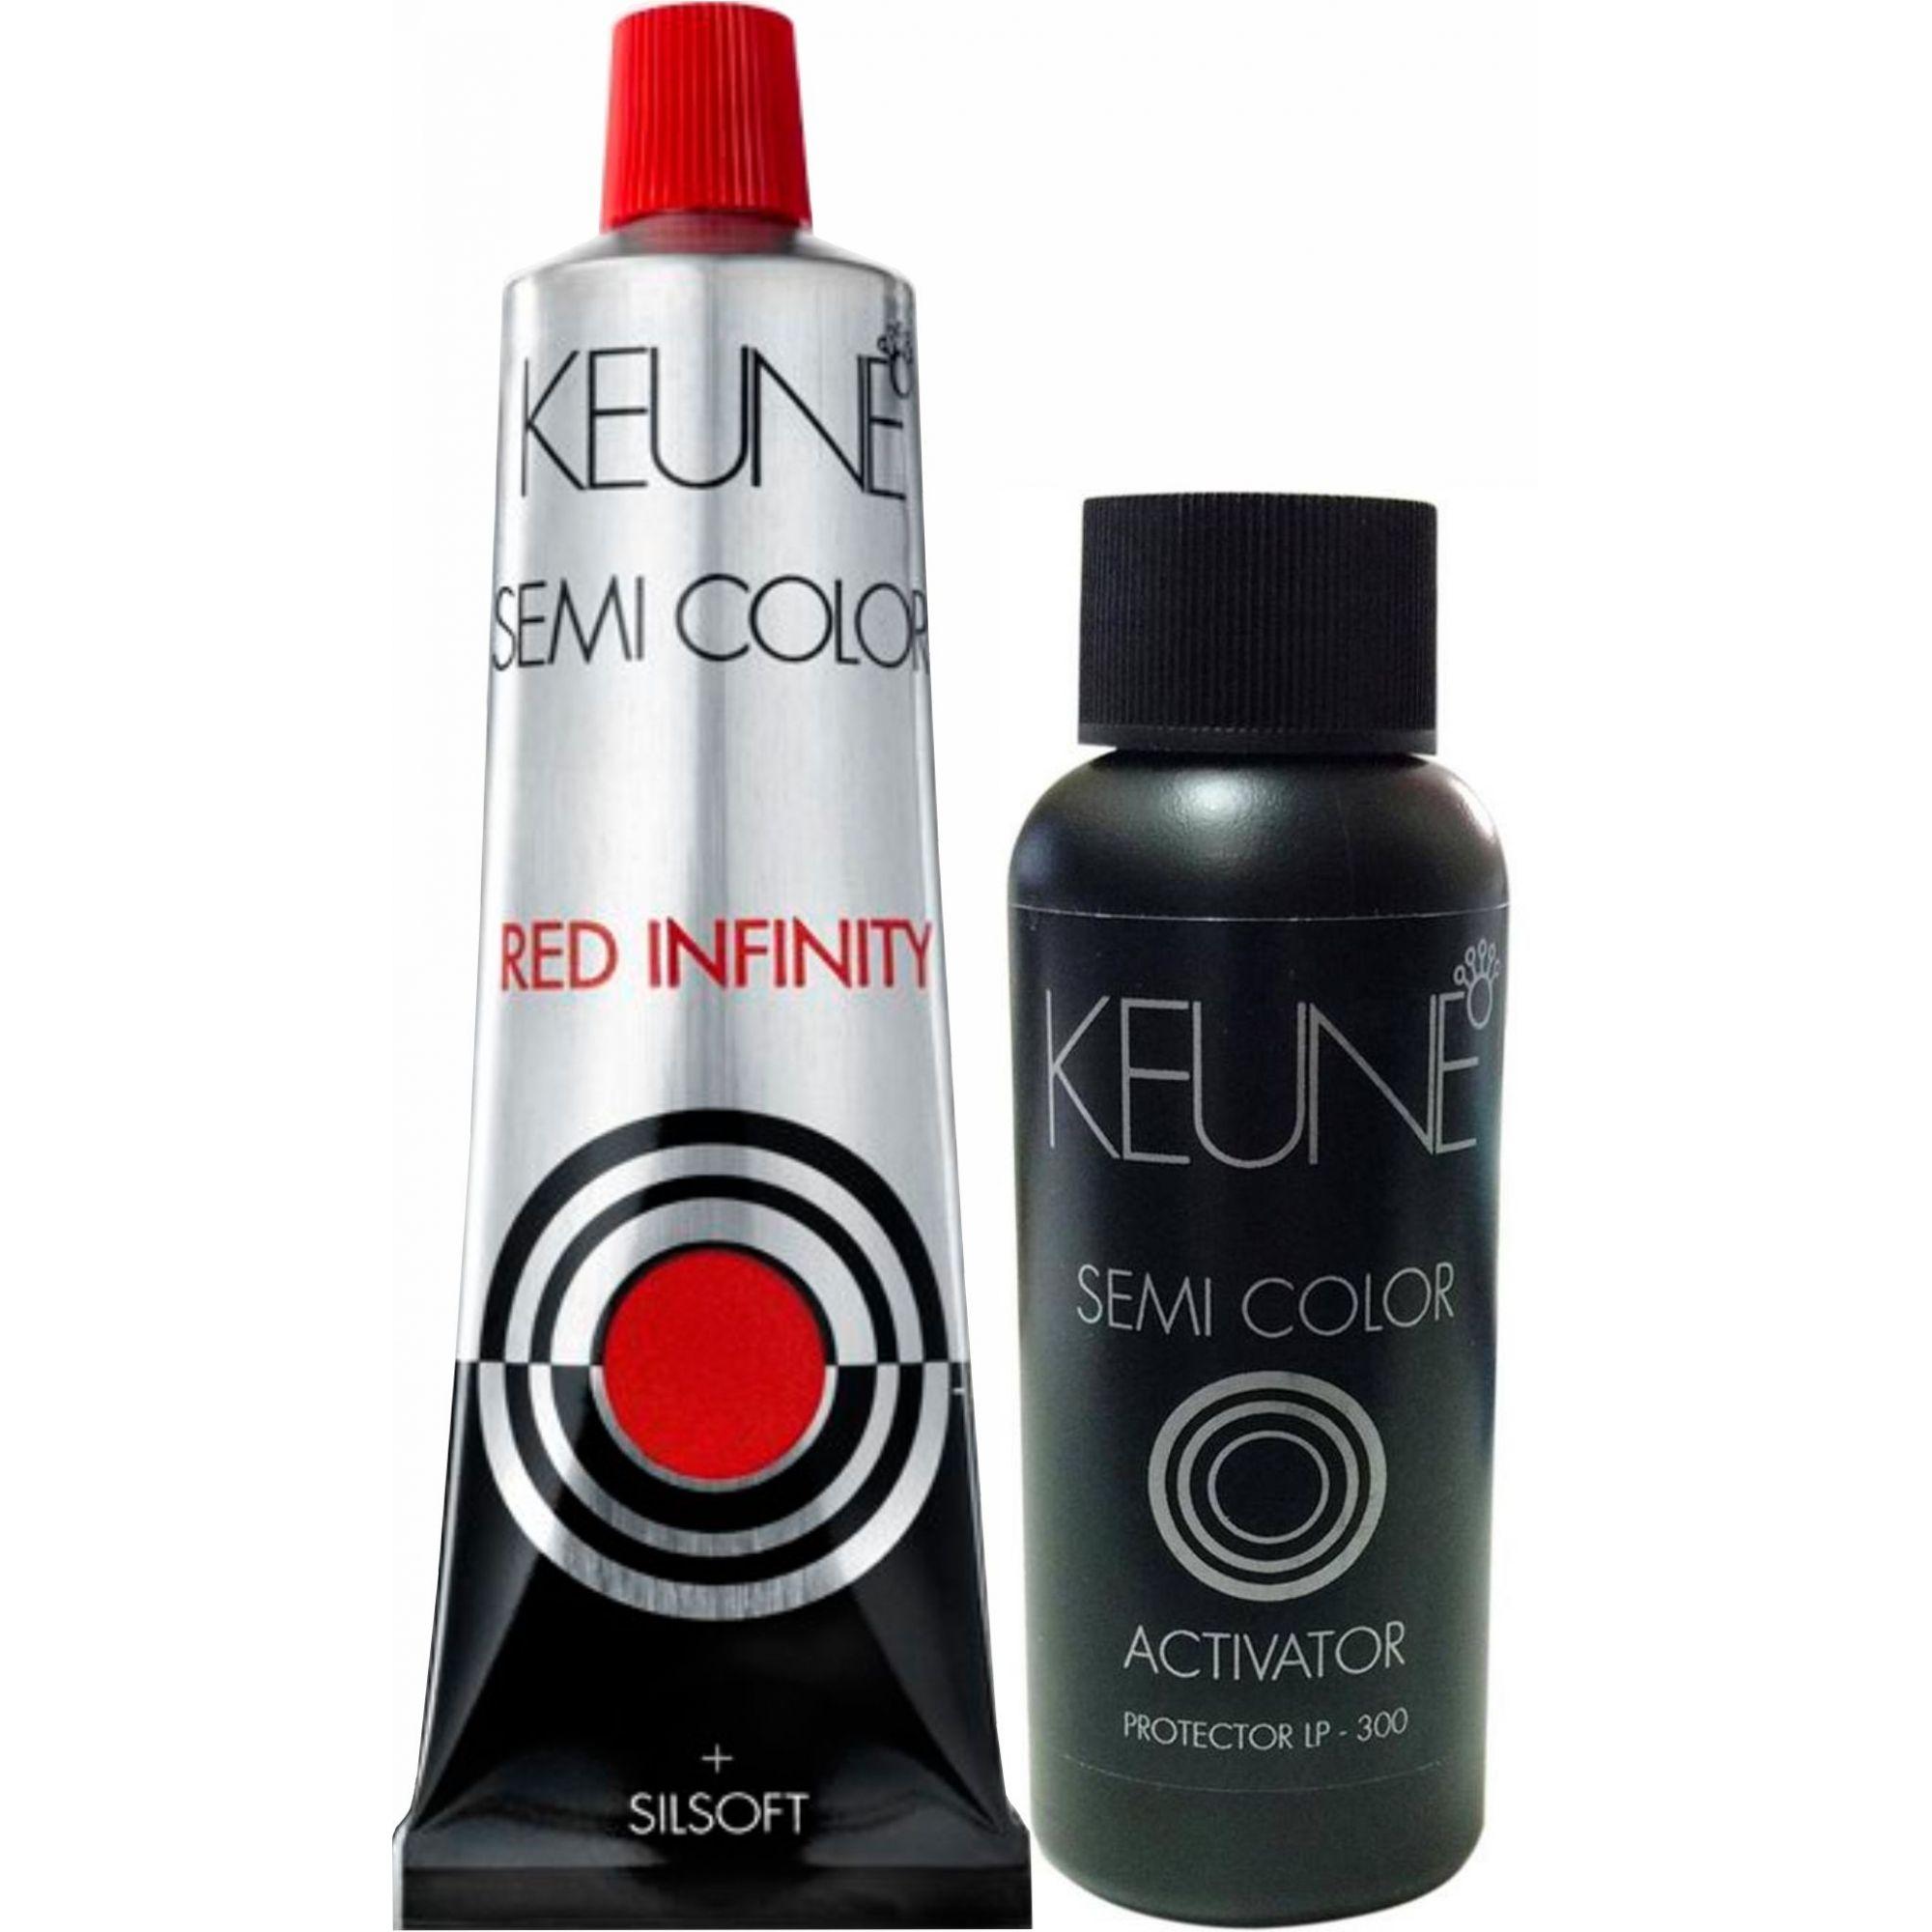 Kit Keune Semi Color RI 60ml - Cor 4.76 - Castanho Médio Violeta + Ativador de 60ml